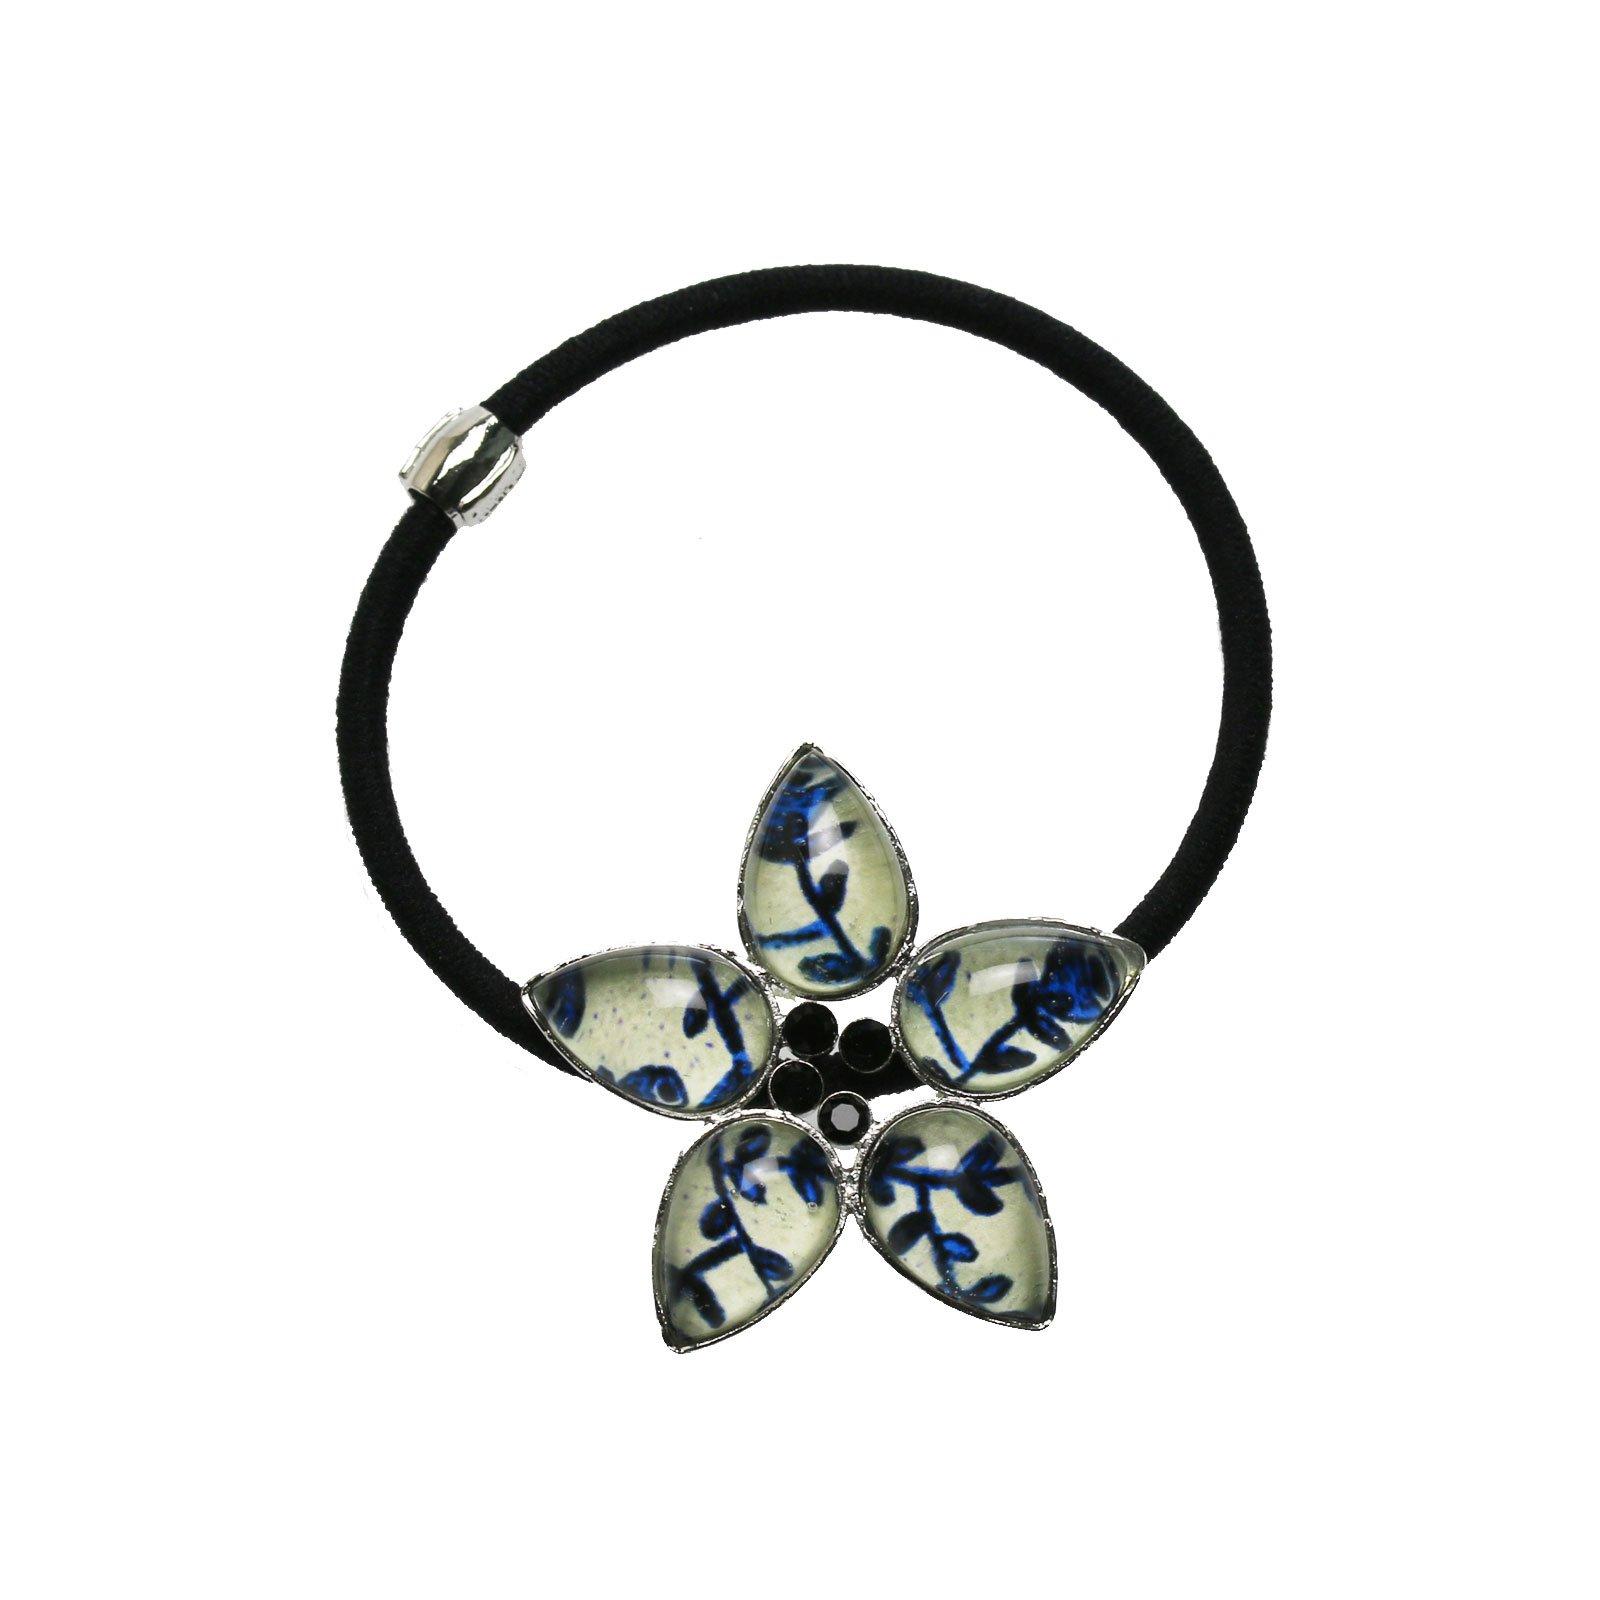 Tamarusan Blue Flower Pattern Ponytail Holder Nickel Free Swarovski Rhinestones